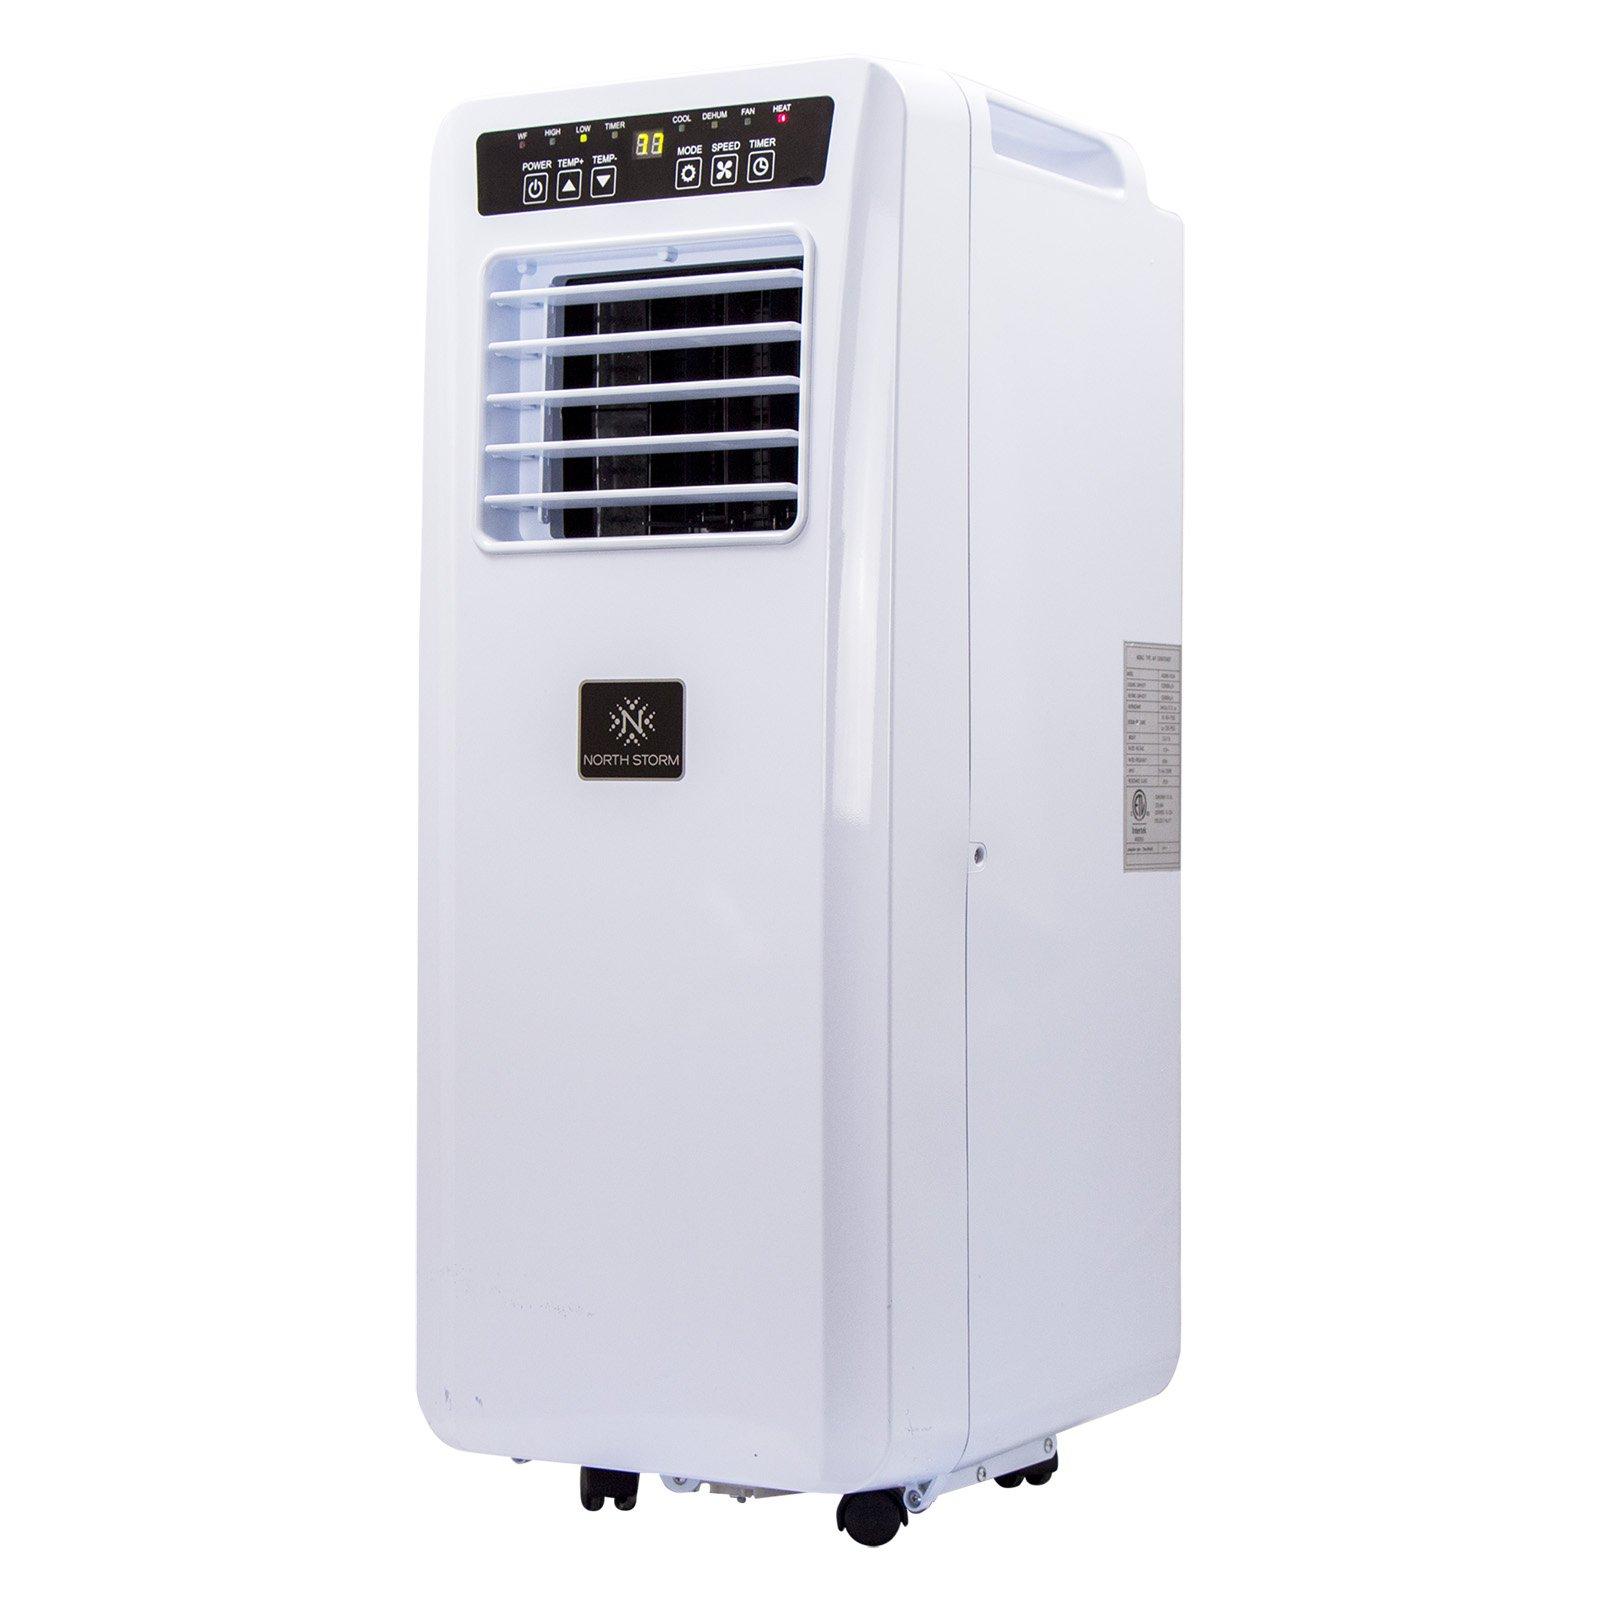 North Storm 4-in-1 12000 BTU Portable Air Conditioner